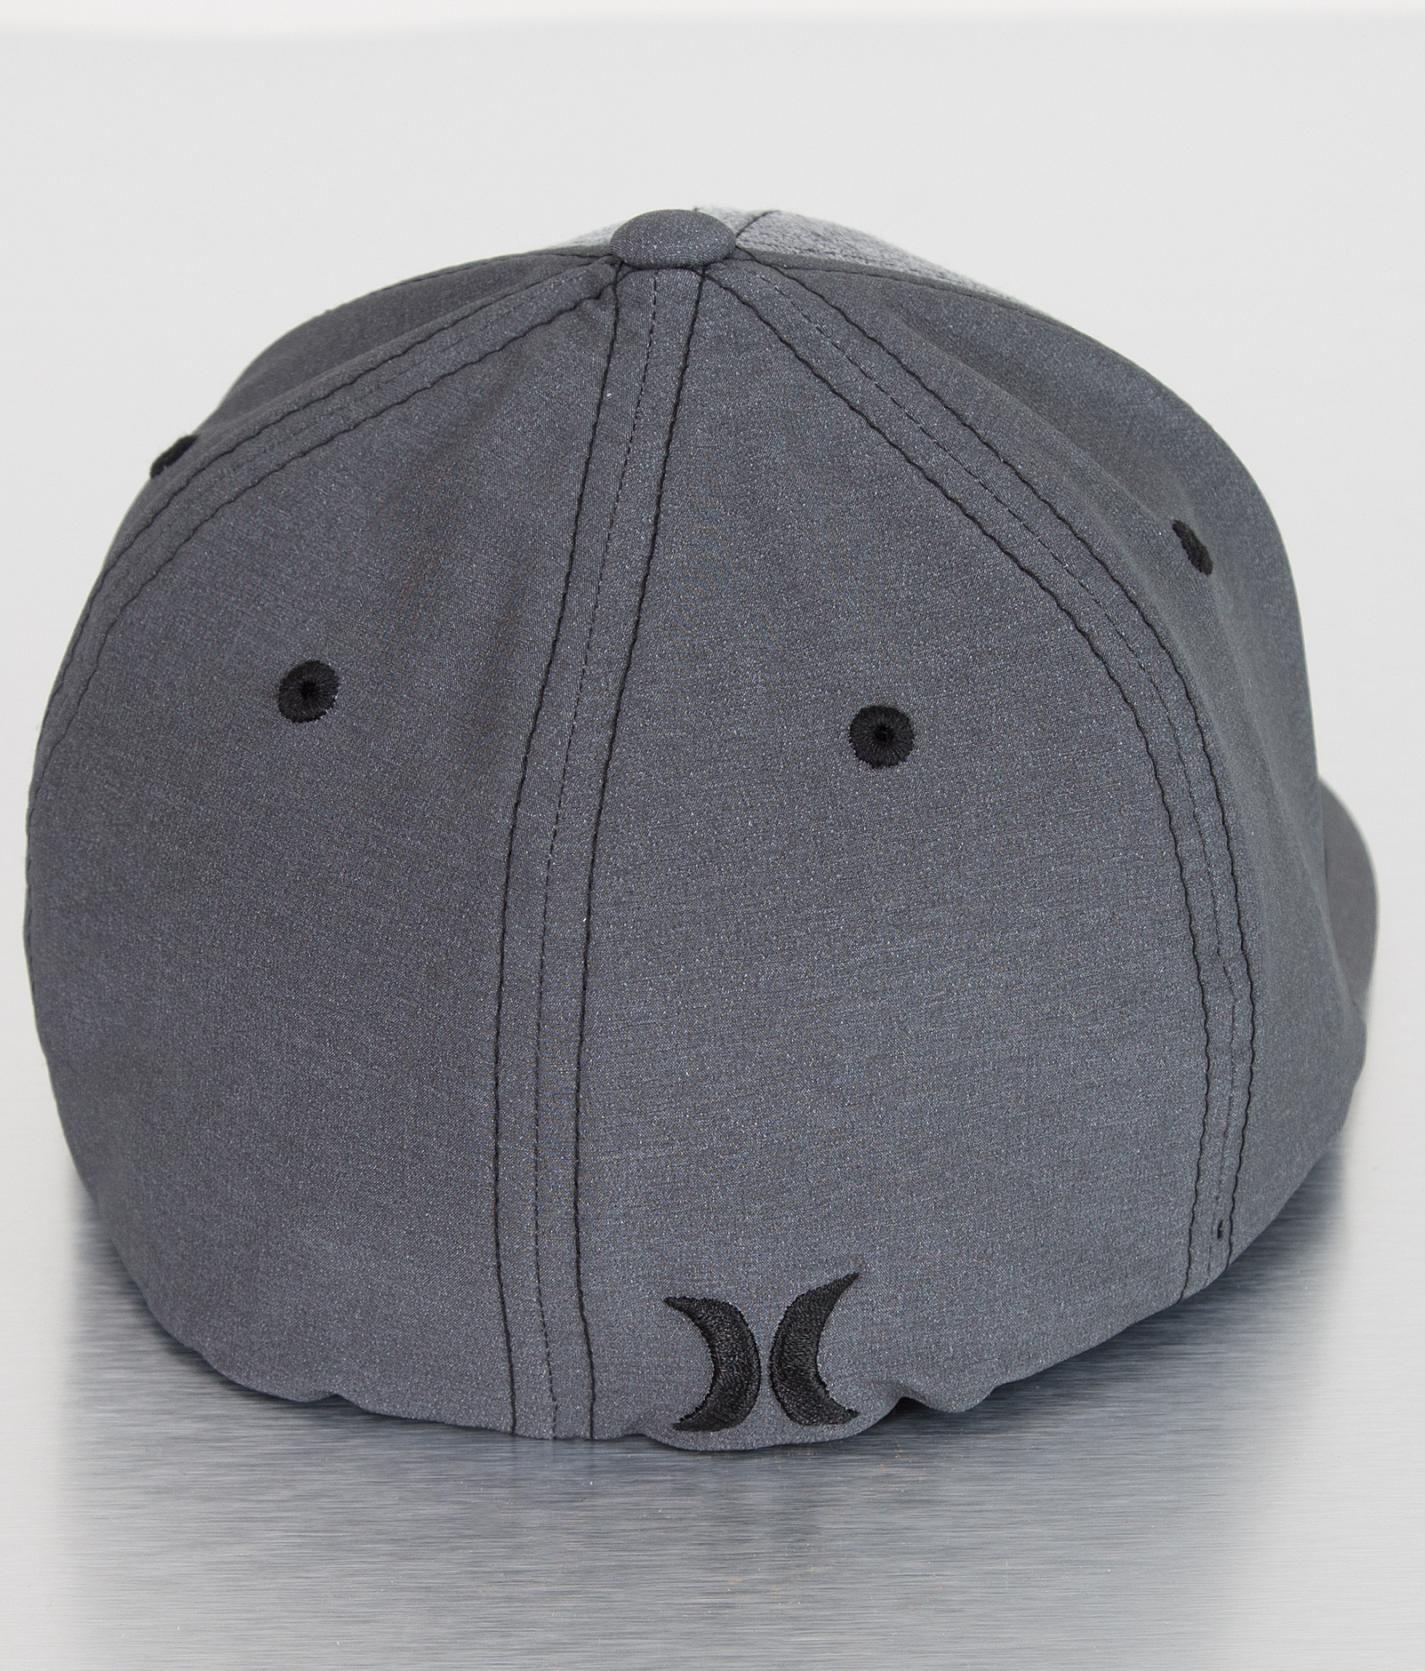 560de56bd3a18 Hurley Duke Everlight Hat - Men s Hats